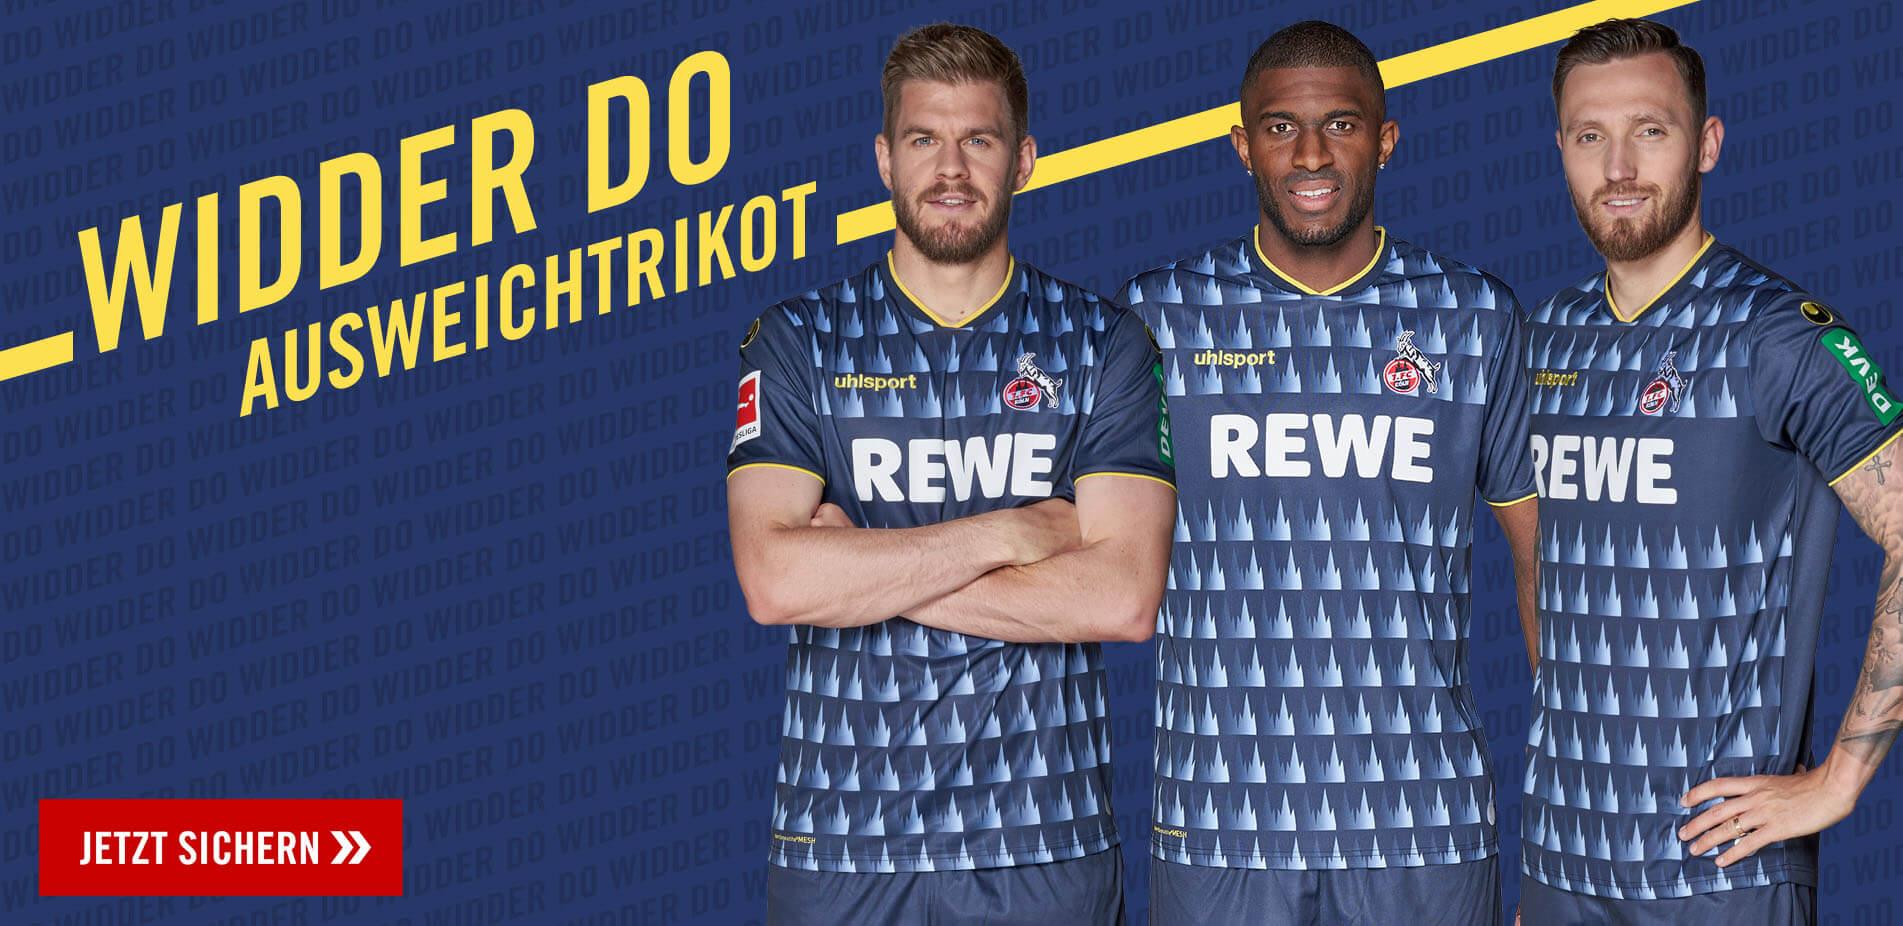 Offizieller 1. FC Köln Fanshop Trikots, Fanartikel und